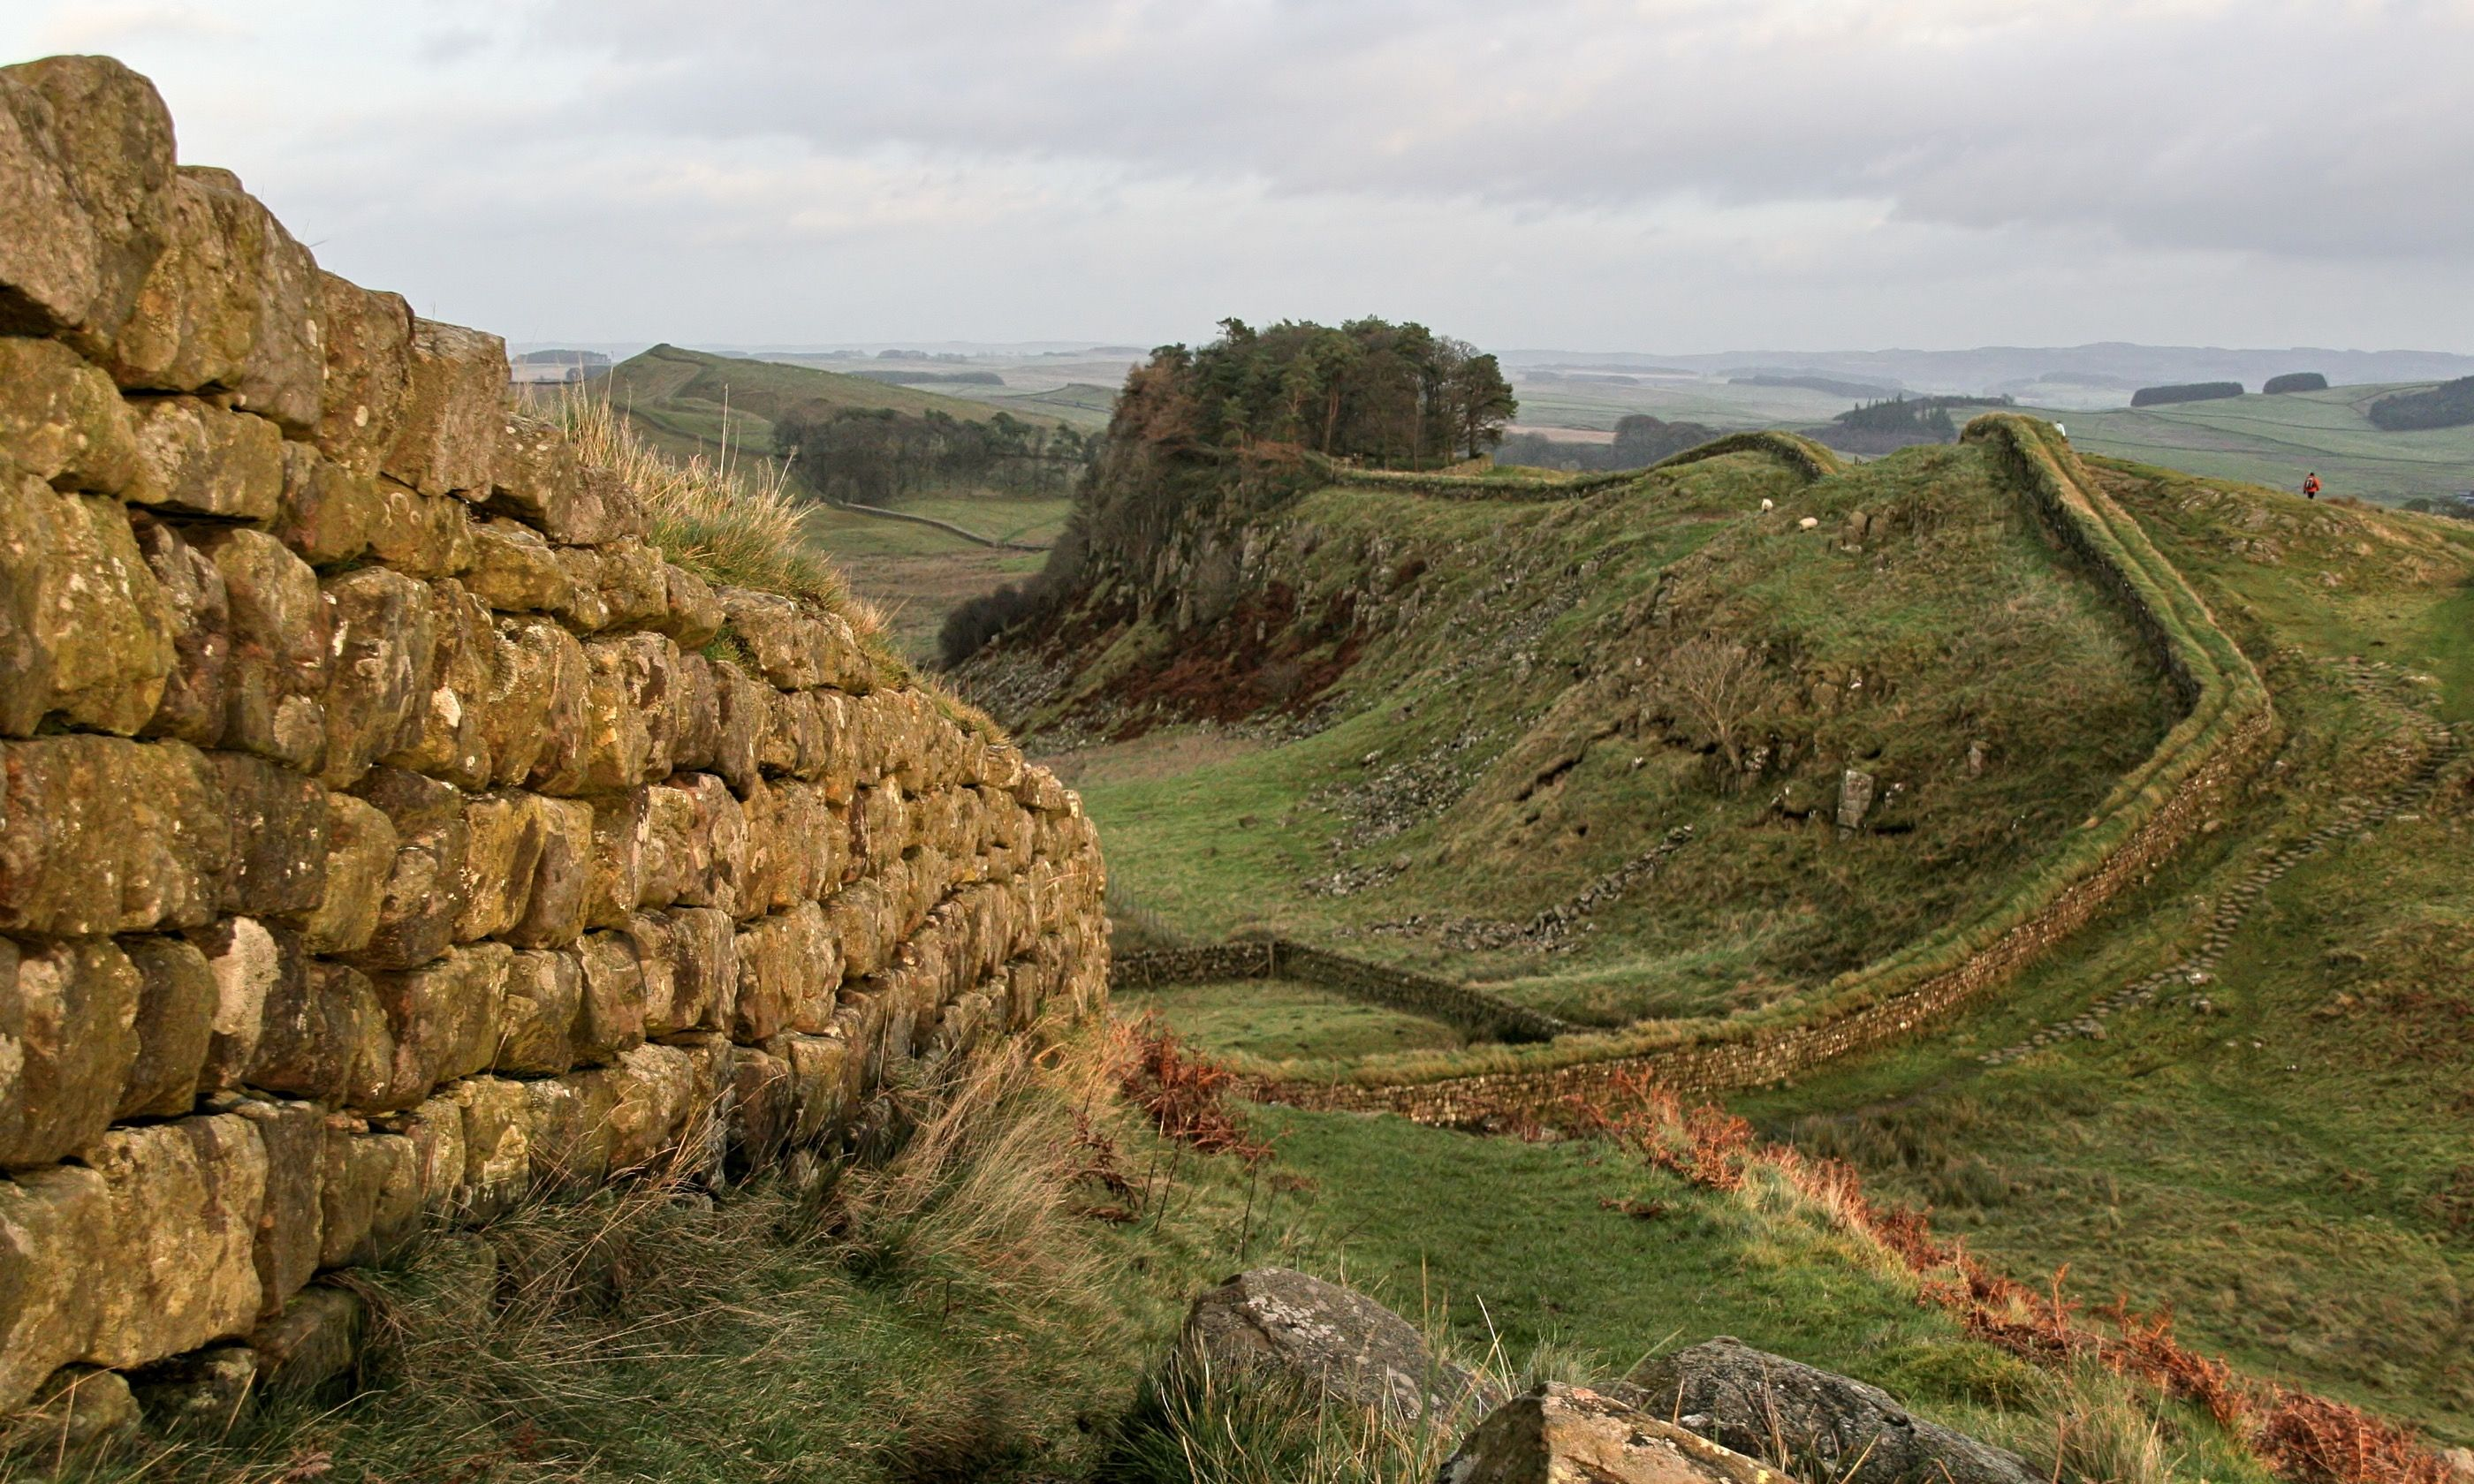 Hadrian's Wall near Housestead (Dreamstime)